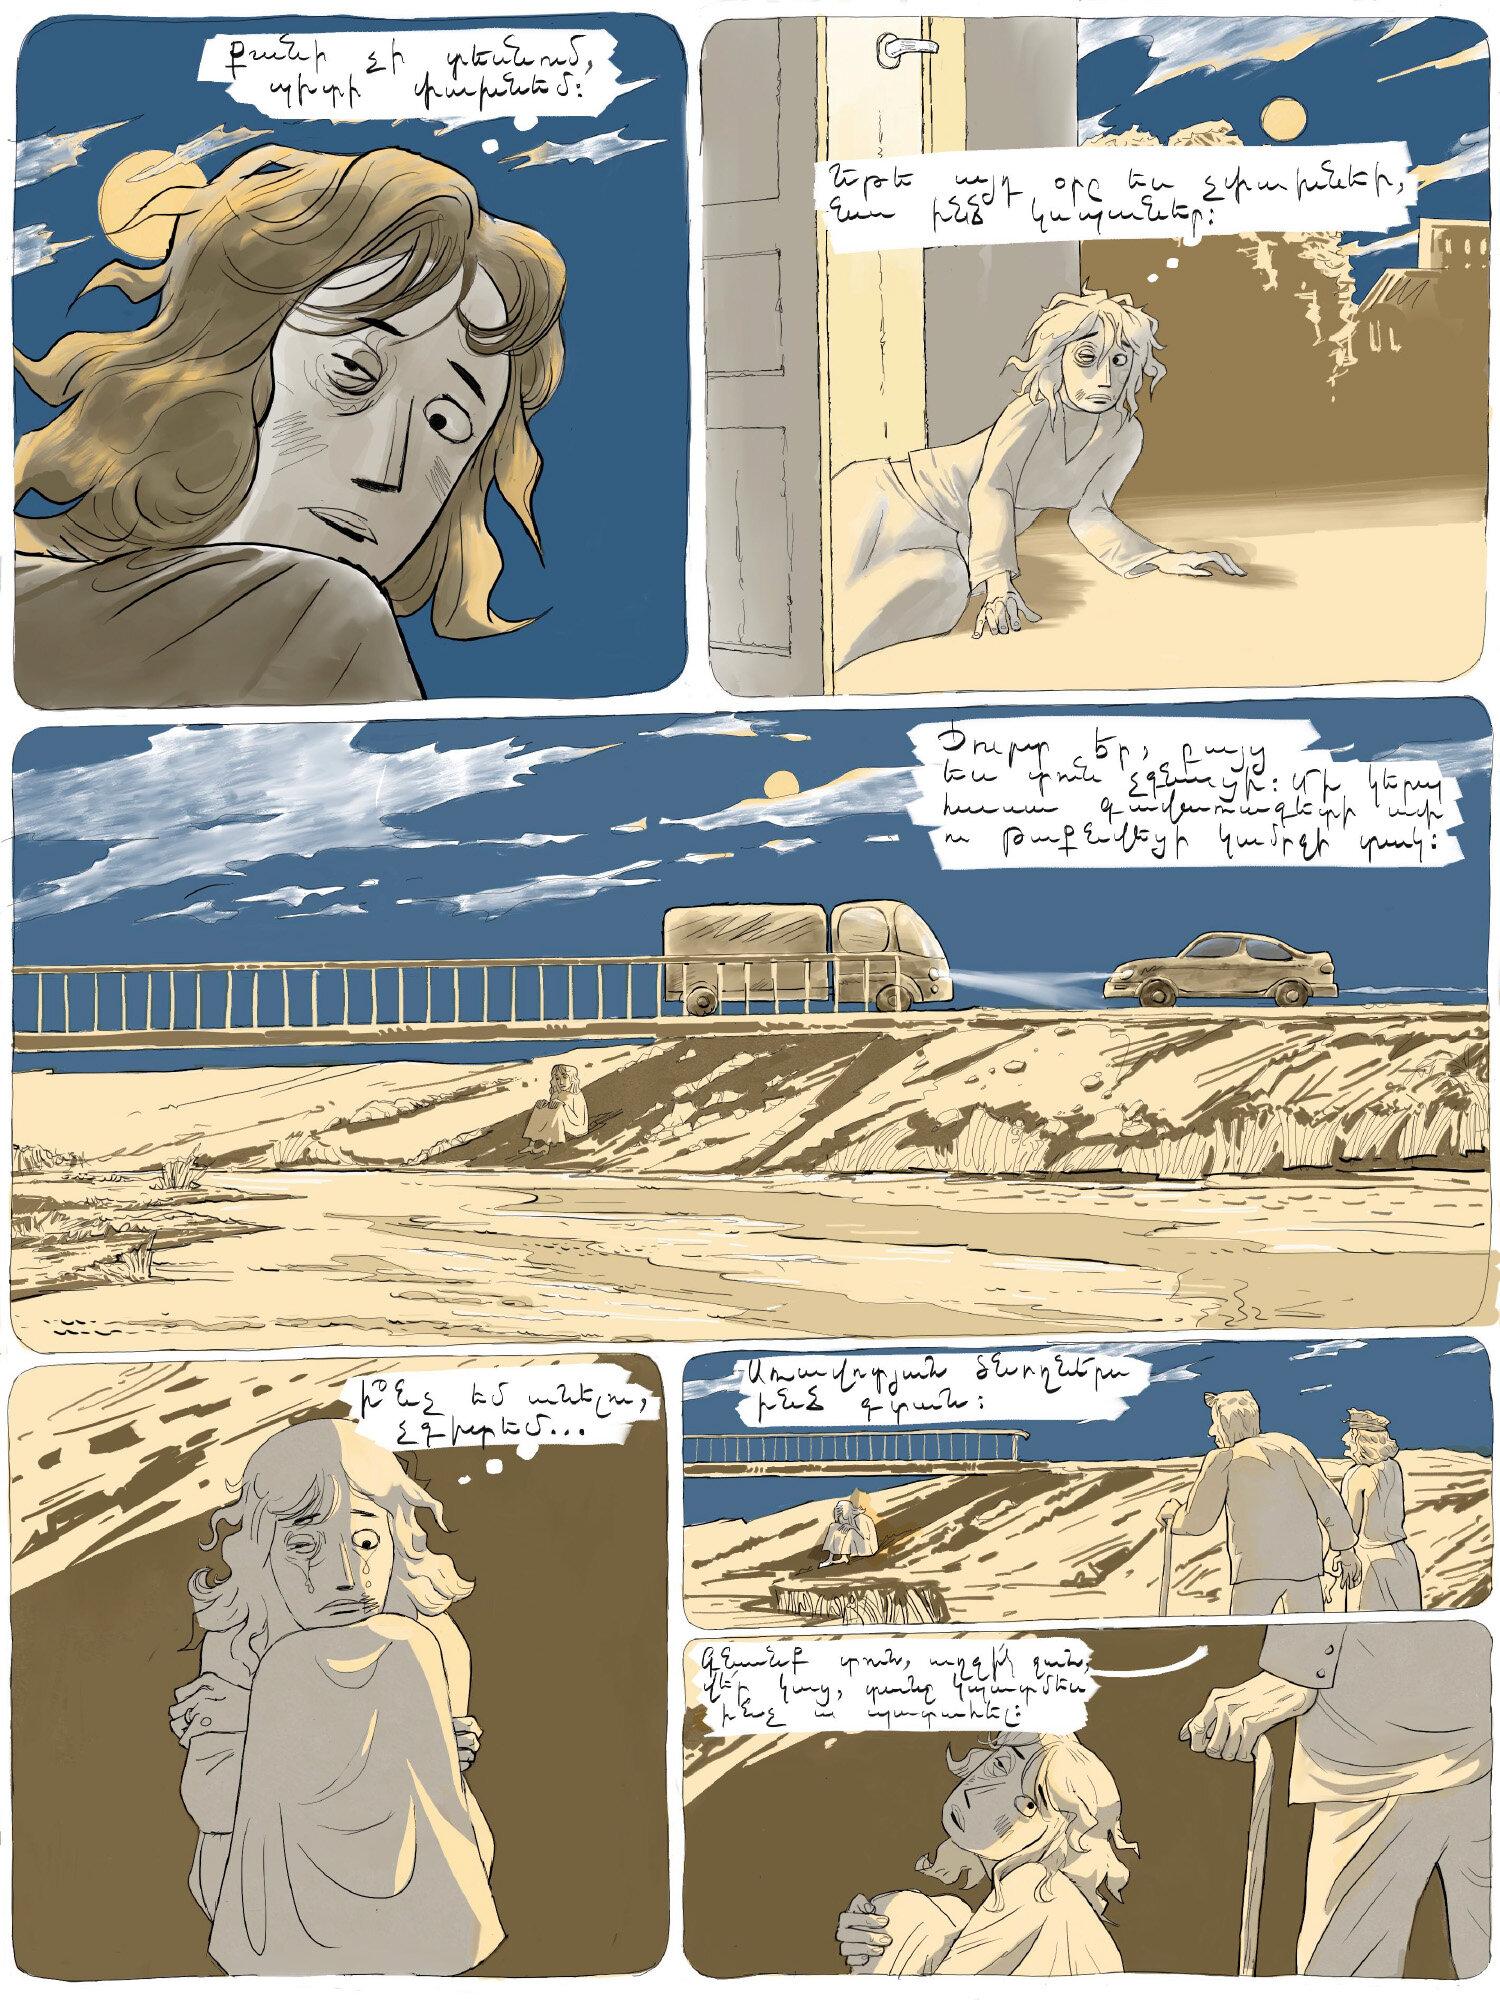 paxlava-comics-4.jpg